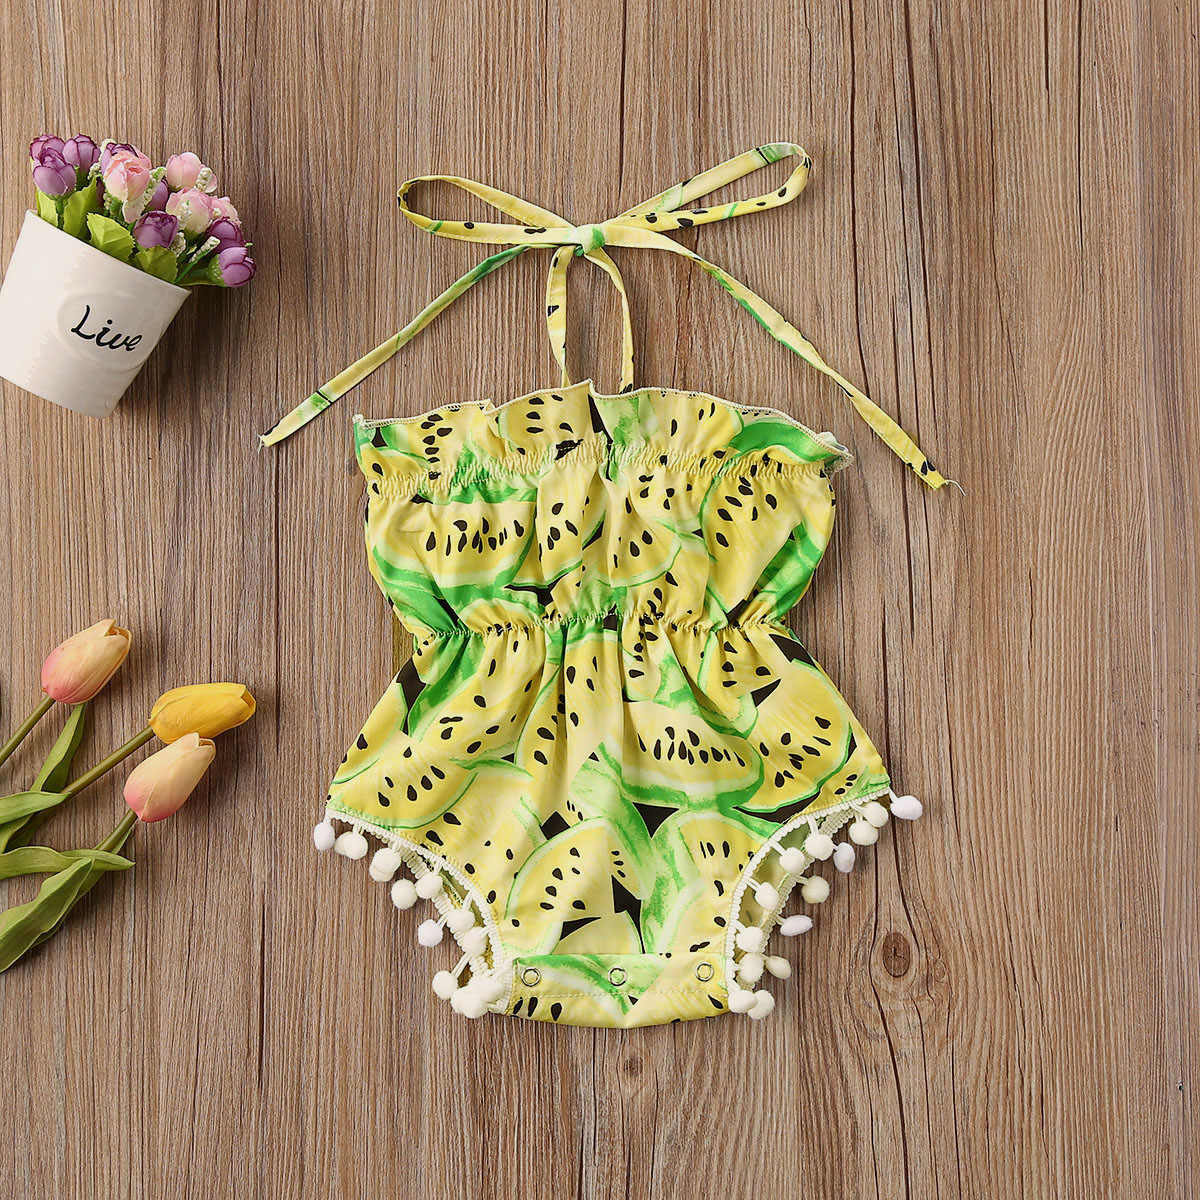 Pasgeboren Baby Baby Meisjes Zomer Katoen Casual Watermeloen Print Jumpsuit Bodysuit Rood Geel Outfits 0-24M